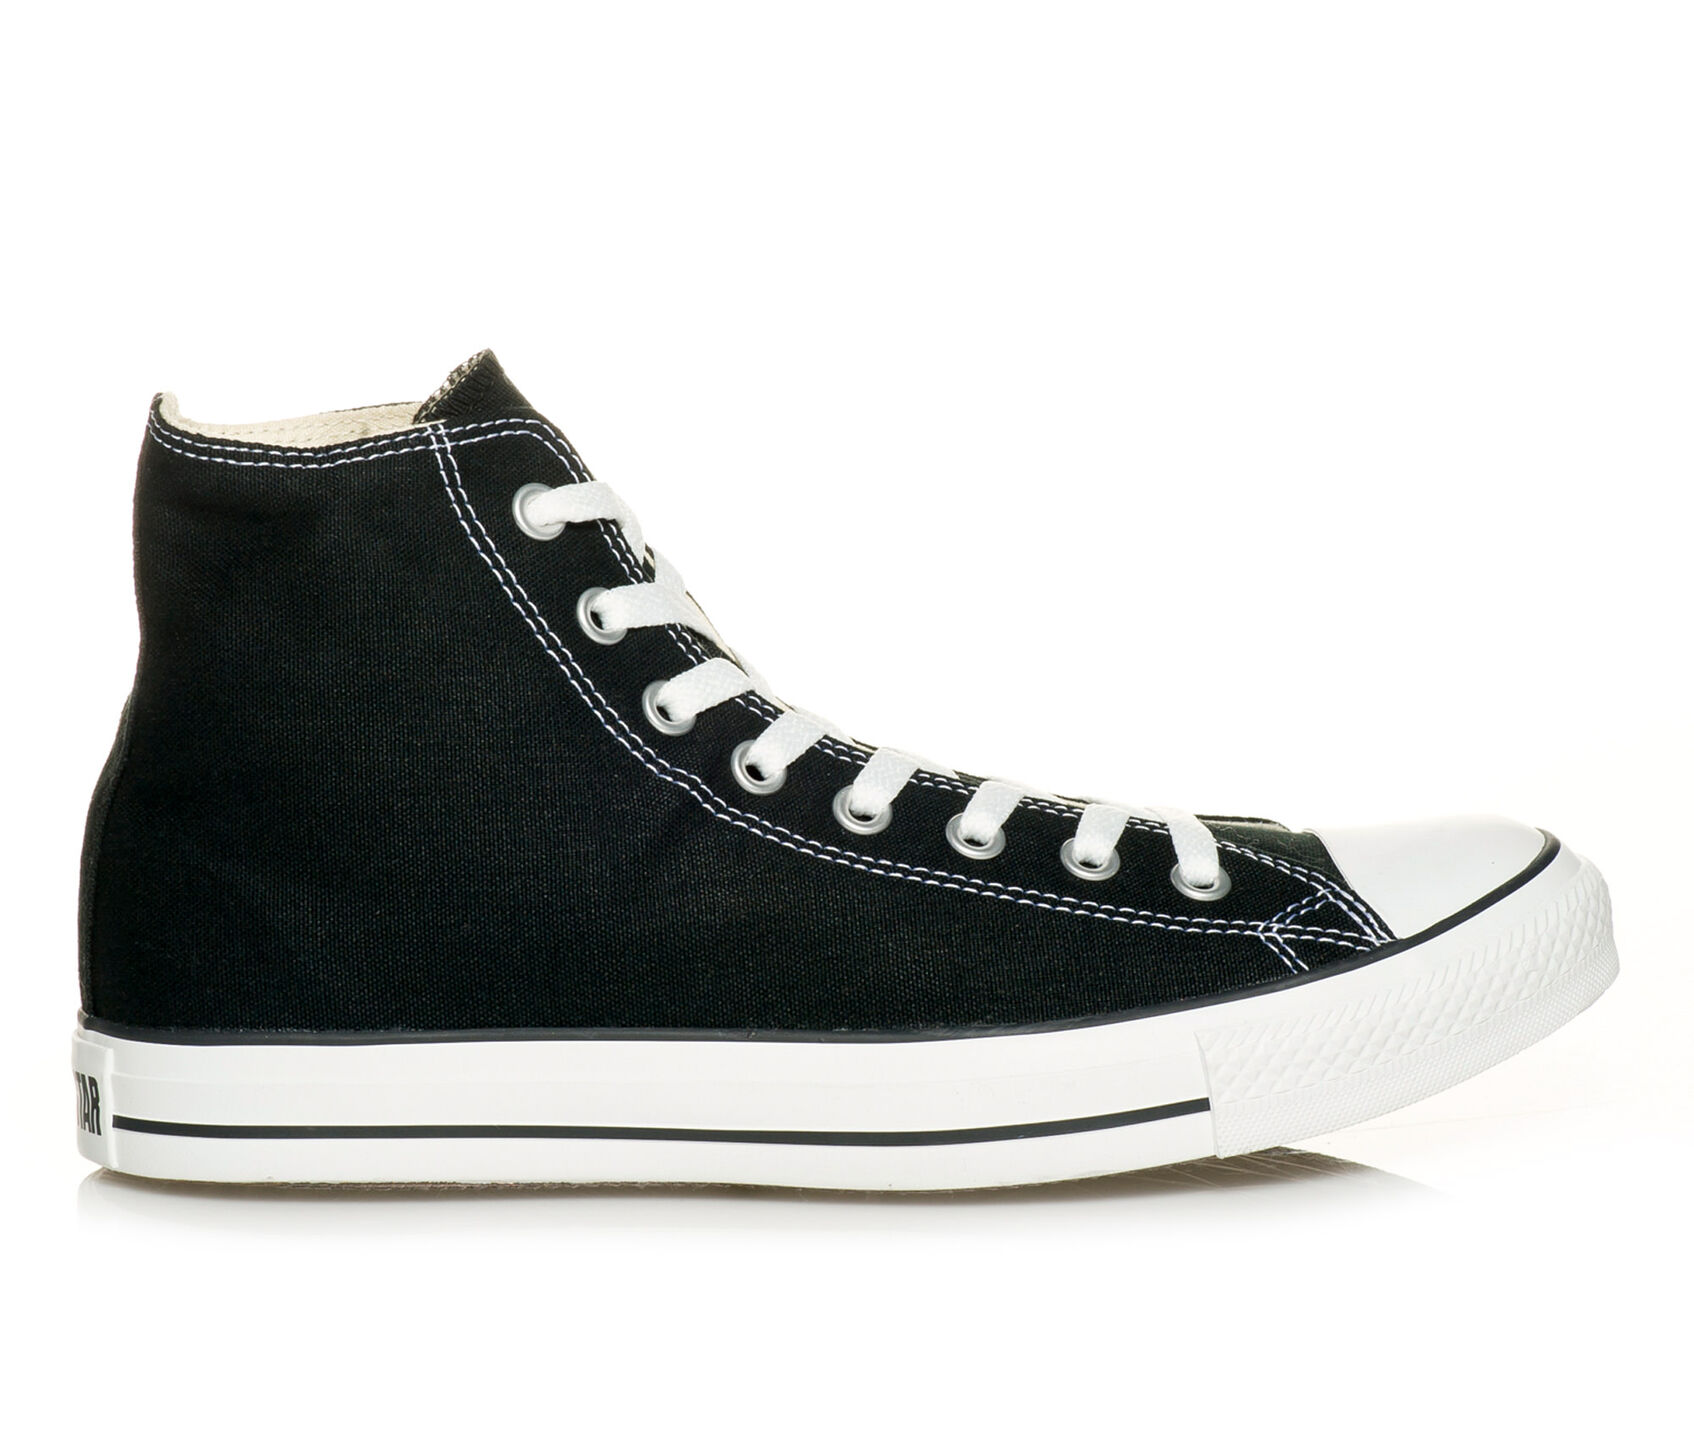 90f3d78519e2 ... Converse Chuck Taylor All Star Canvas Hi High Top Sneakers. Previous